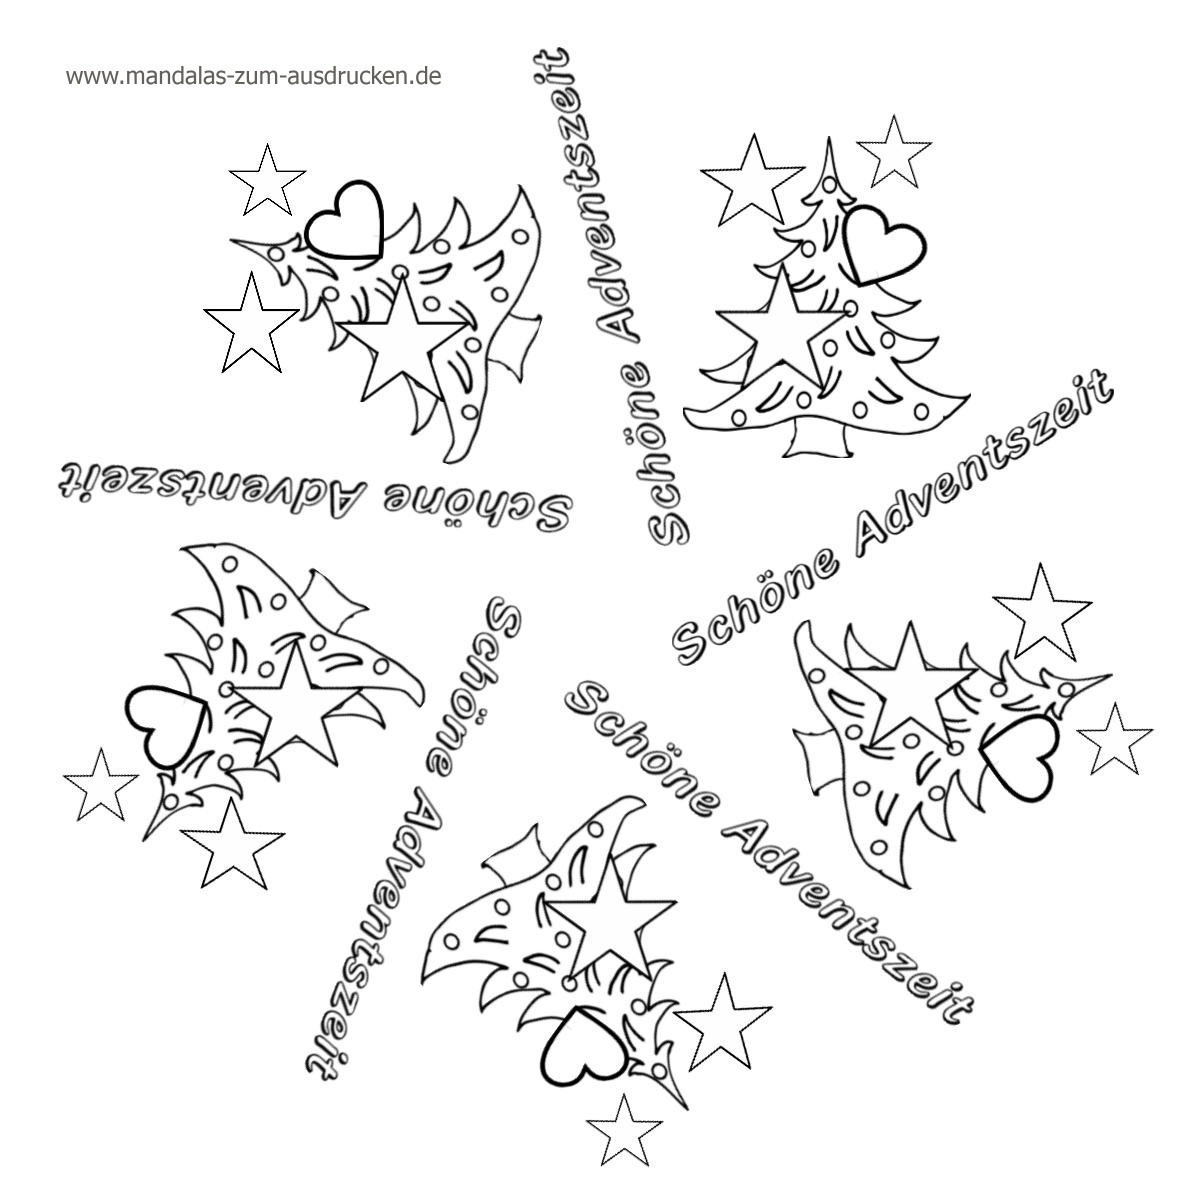 Ausmalbild Weihnachten Bilder Zum Ausmalen Inspirierend Ausmalbilder Weihnachten Mandala Weihnachten Mandala Fotografieren